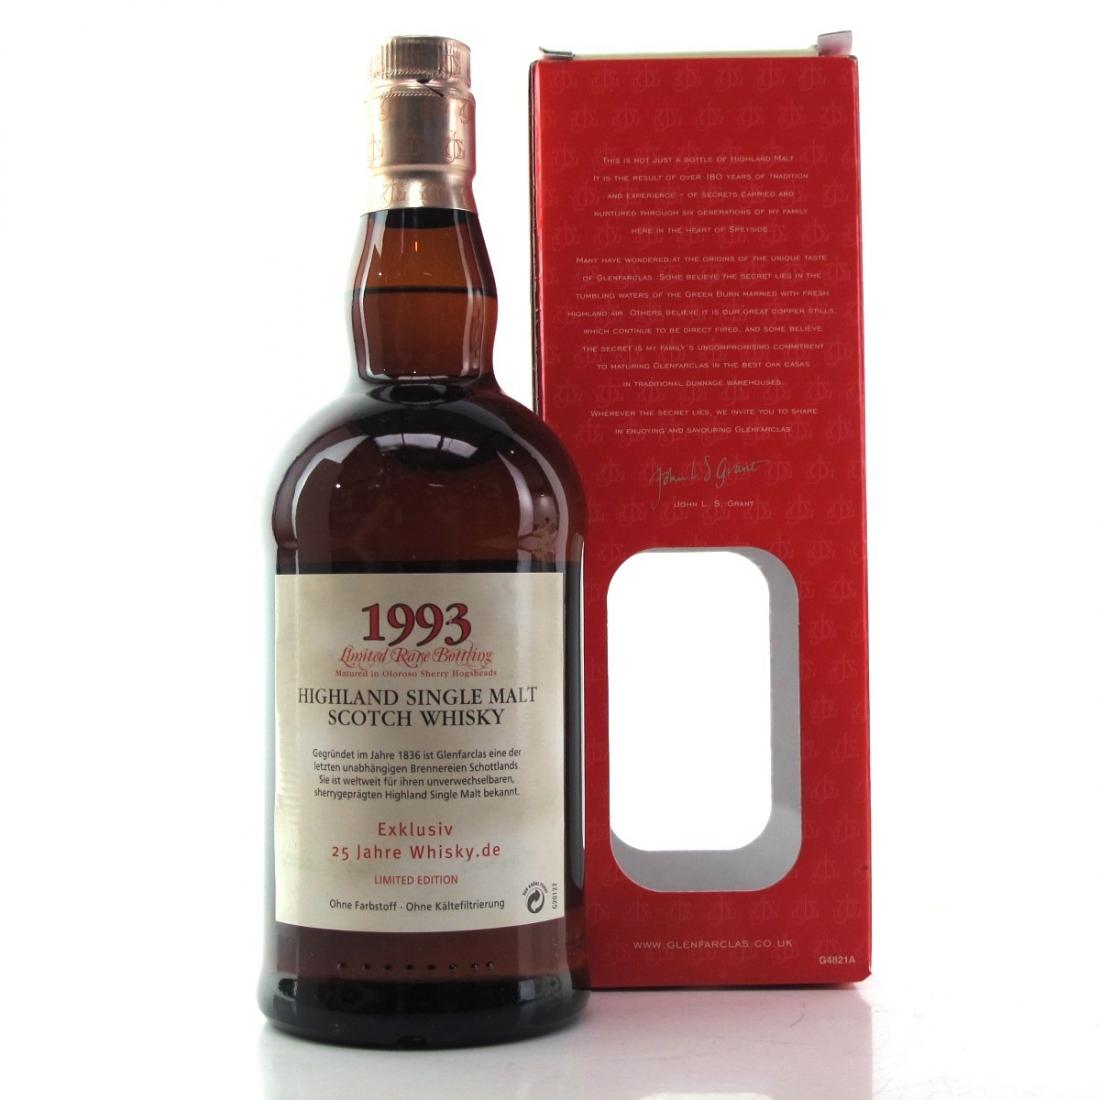 Glenfarclas 1993 Oloroso Sherry Hogsheads / Whisky.de 25 Anniversary